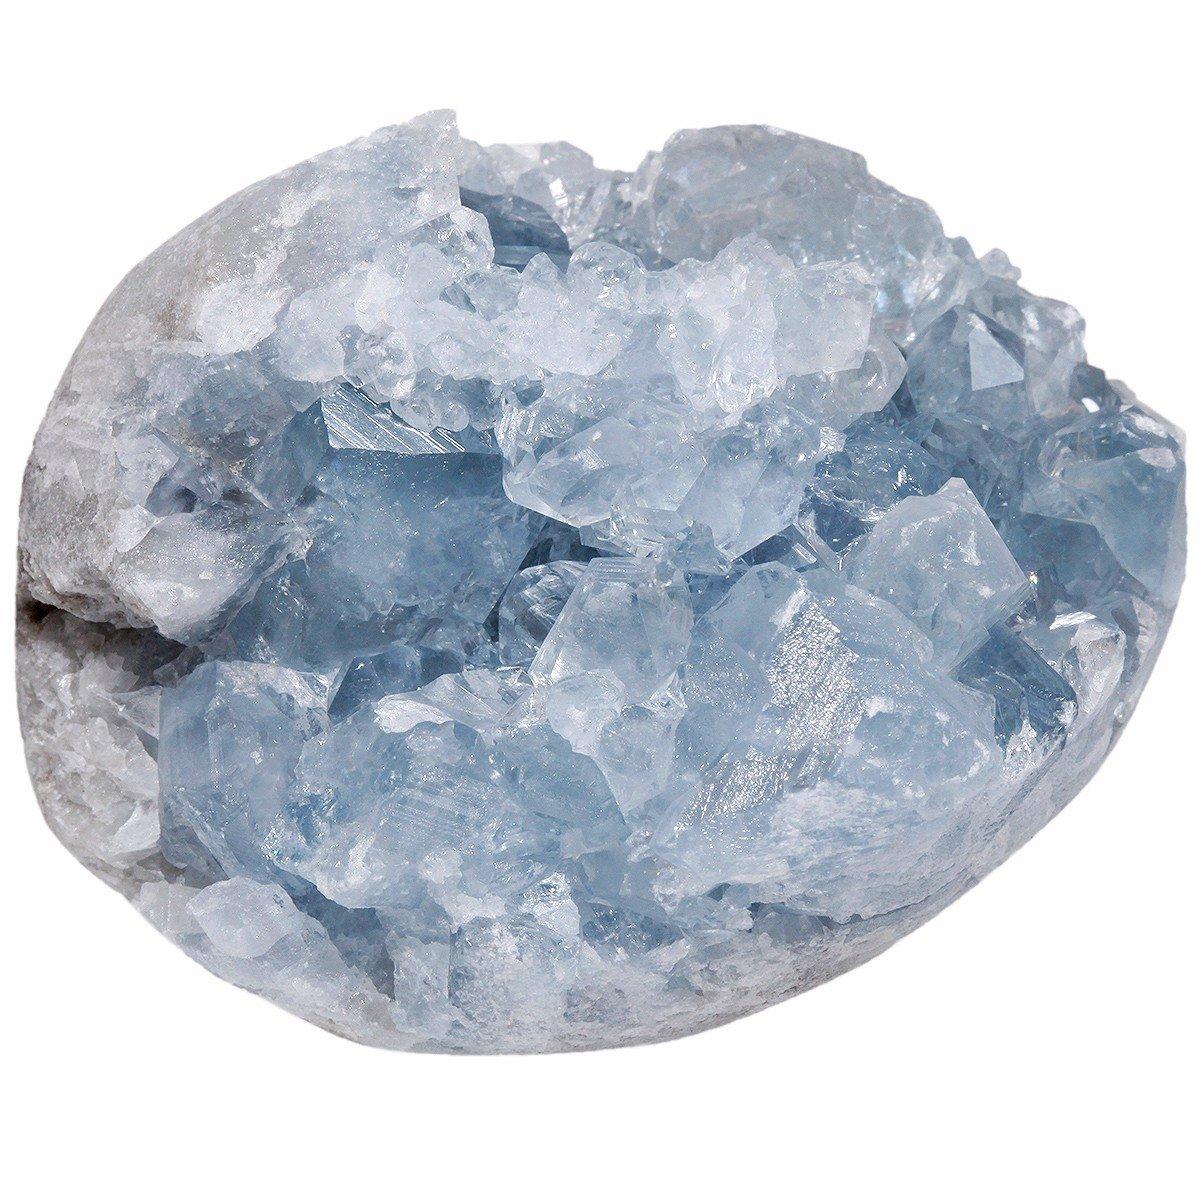 SERIES #6138 HTF! STARBUCKS 2016 SAN DIEGO WRITTEN IN METALLIC BLUE GIFT CARD